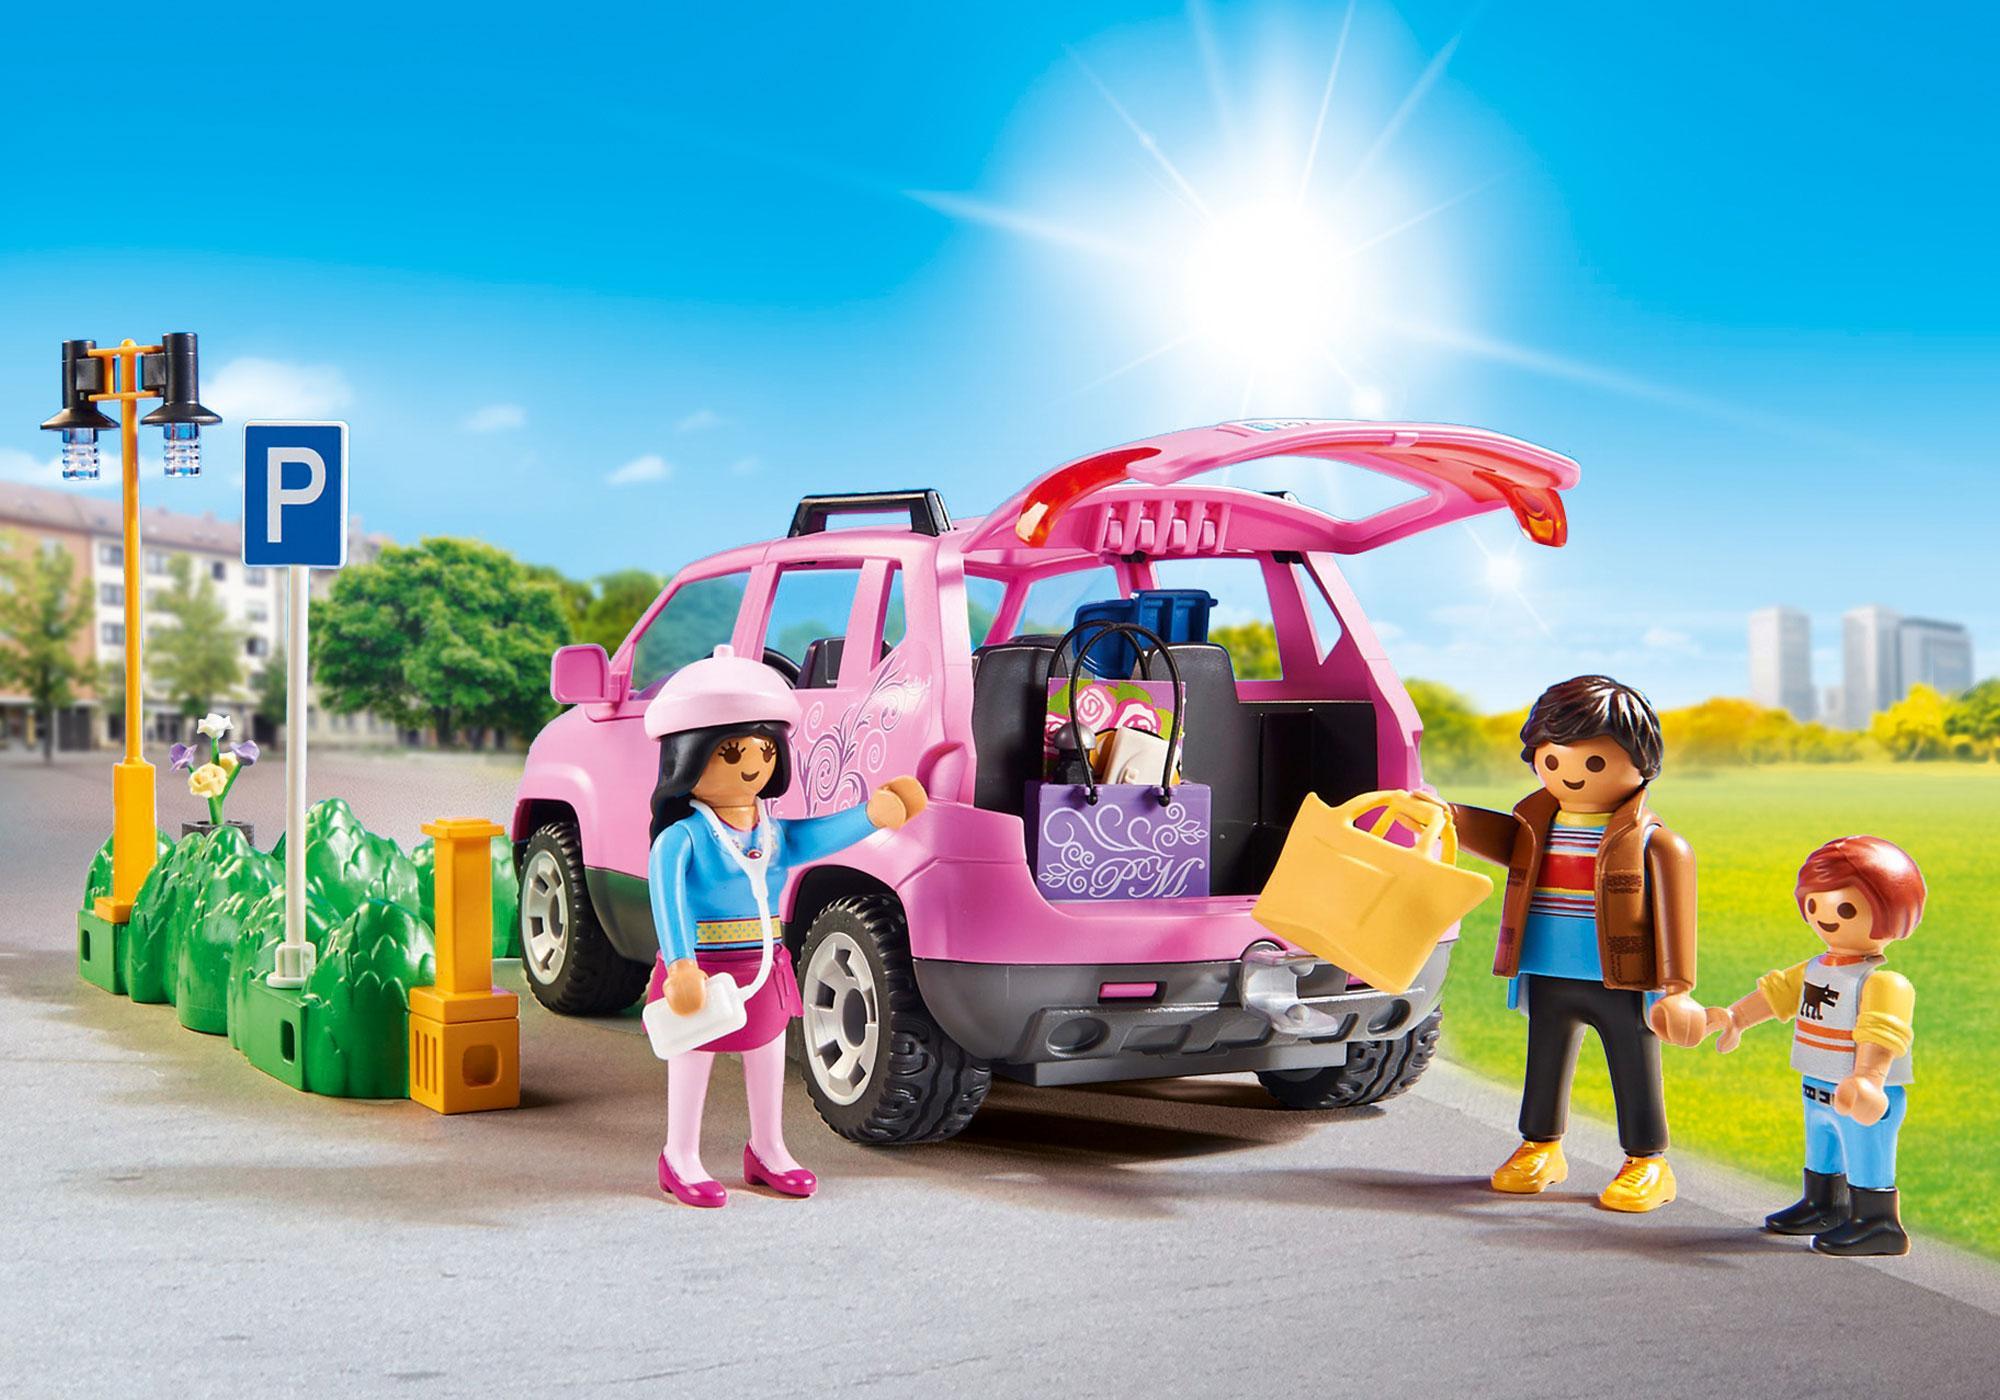 http://media.playmobil.com/i/playmobil/9404_product_extra1/Famiglia al parcheggio dell'outlet